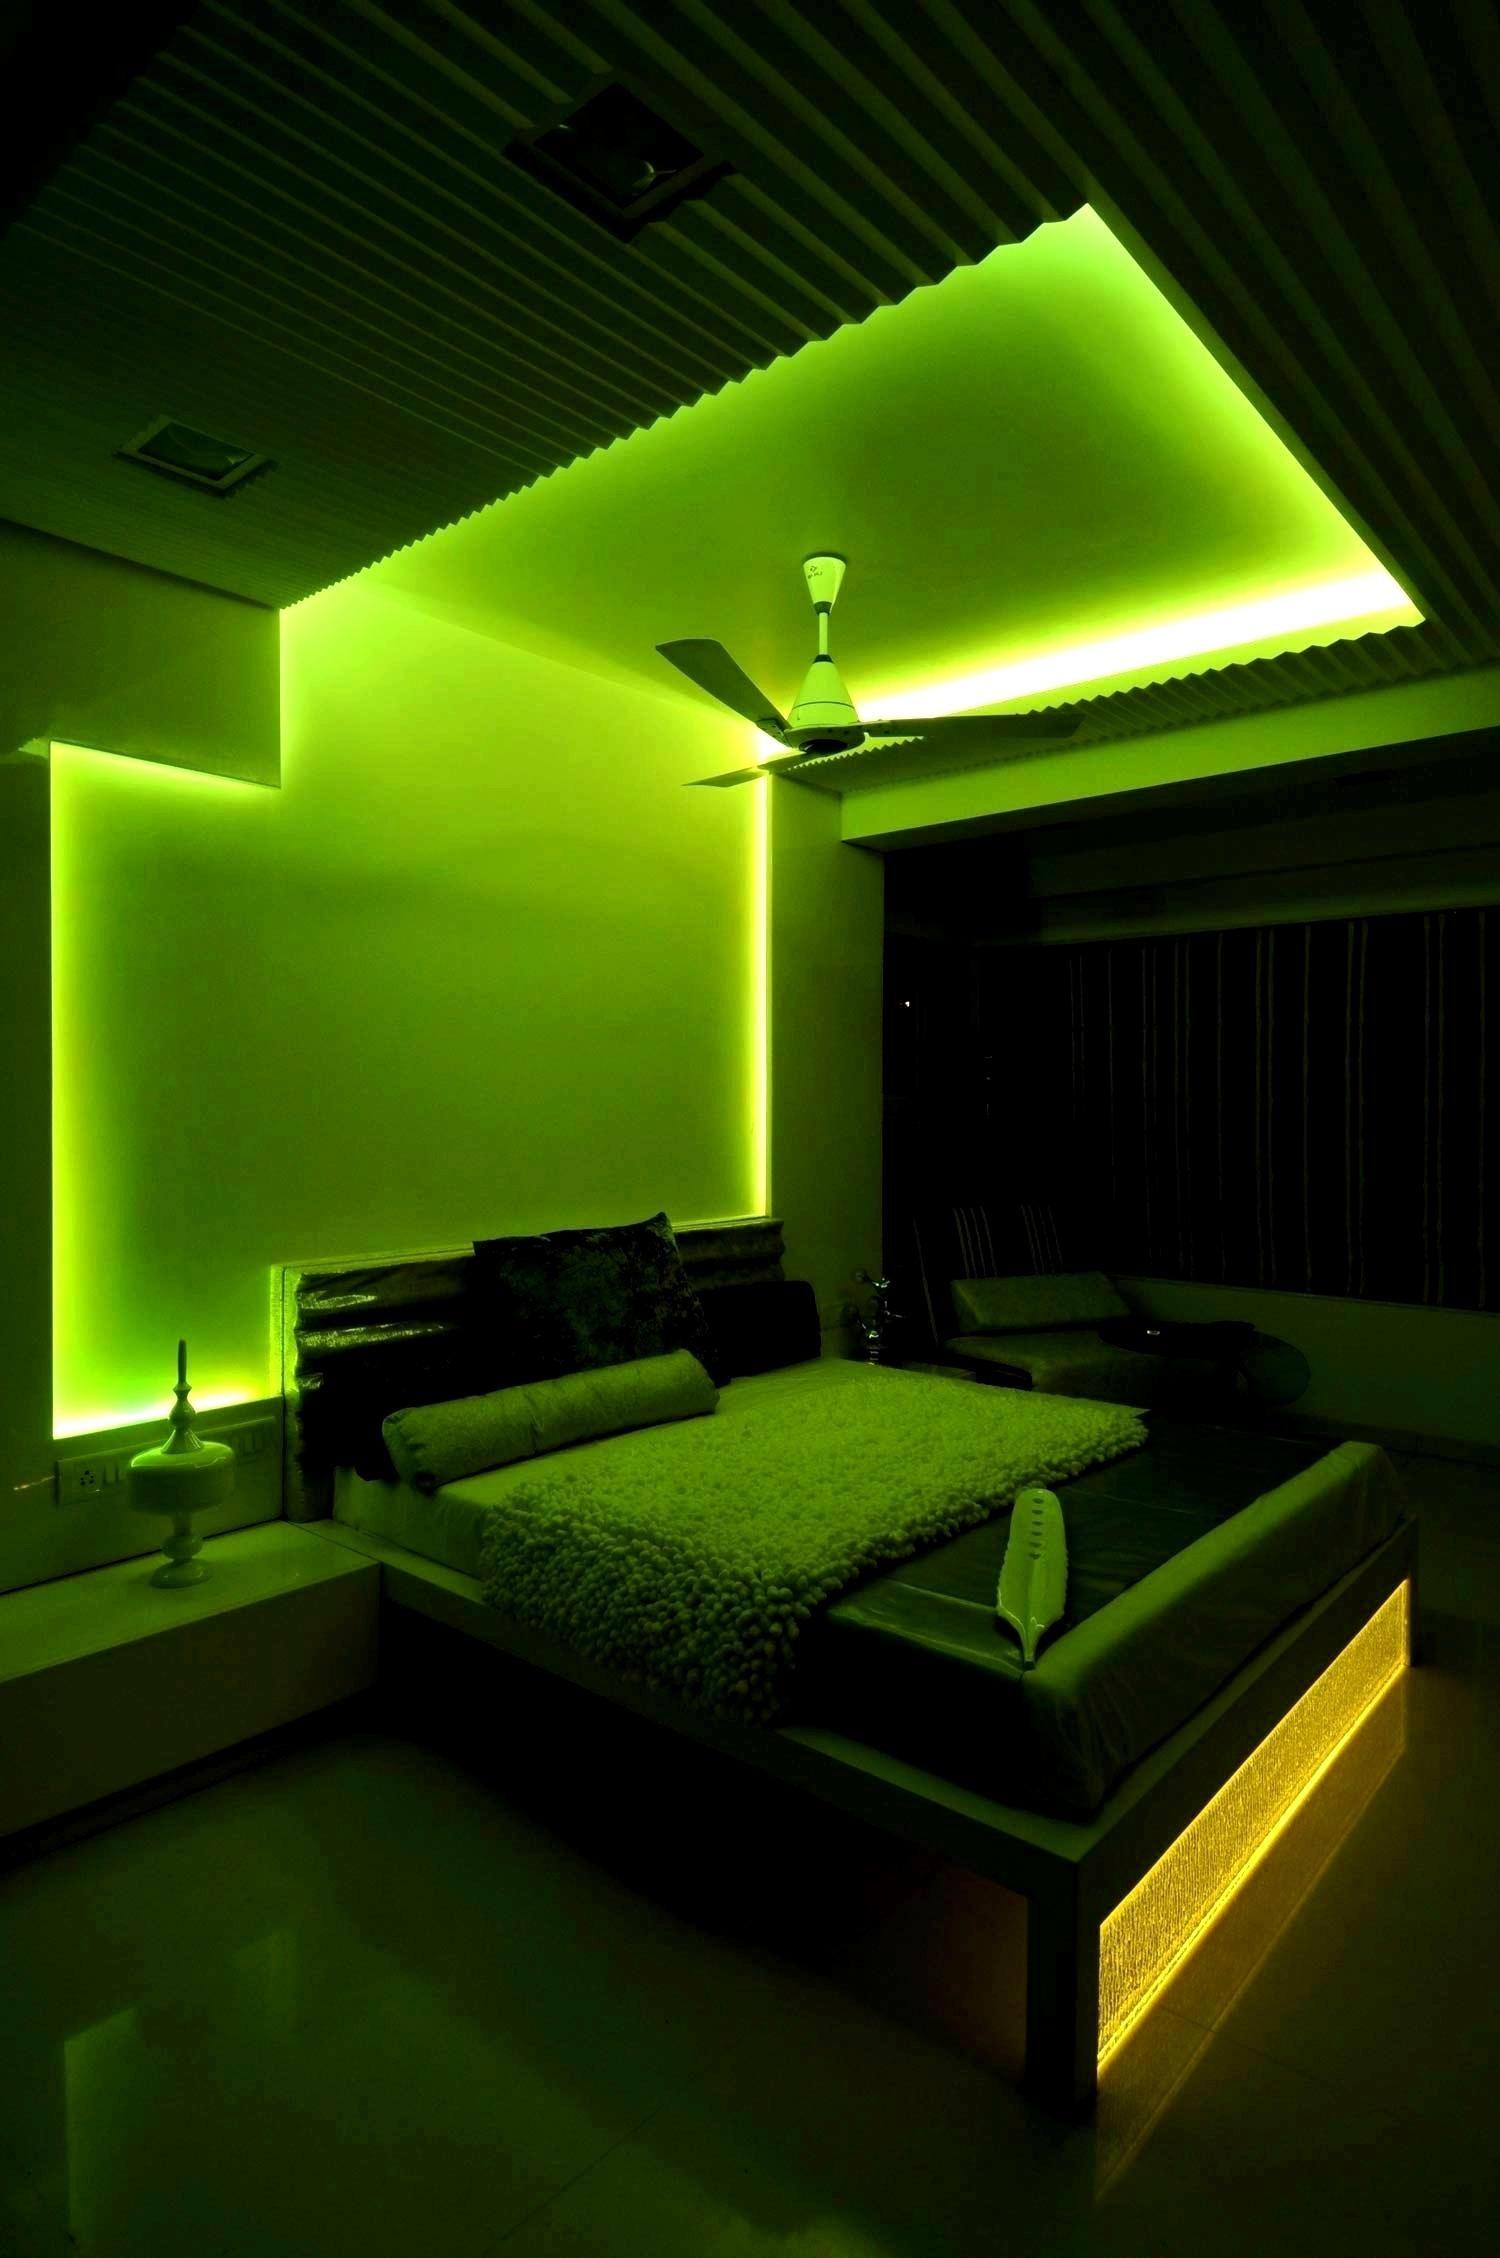 Delightful splendid black room designs neon bedroom ideas neon green zebra bright walls fcdabecfaadacc accessories pillowcases